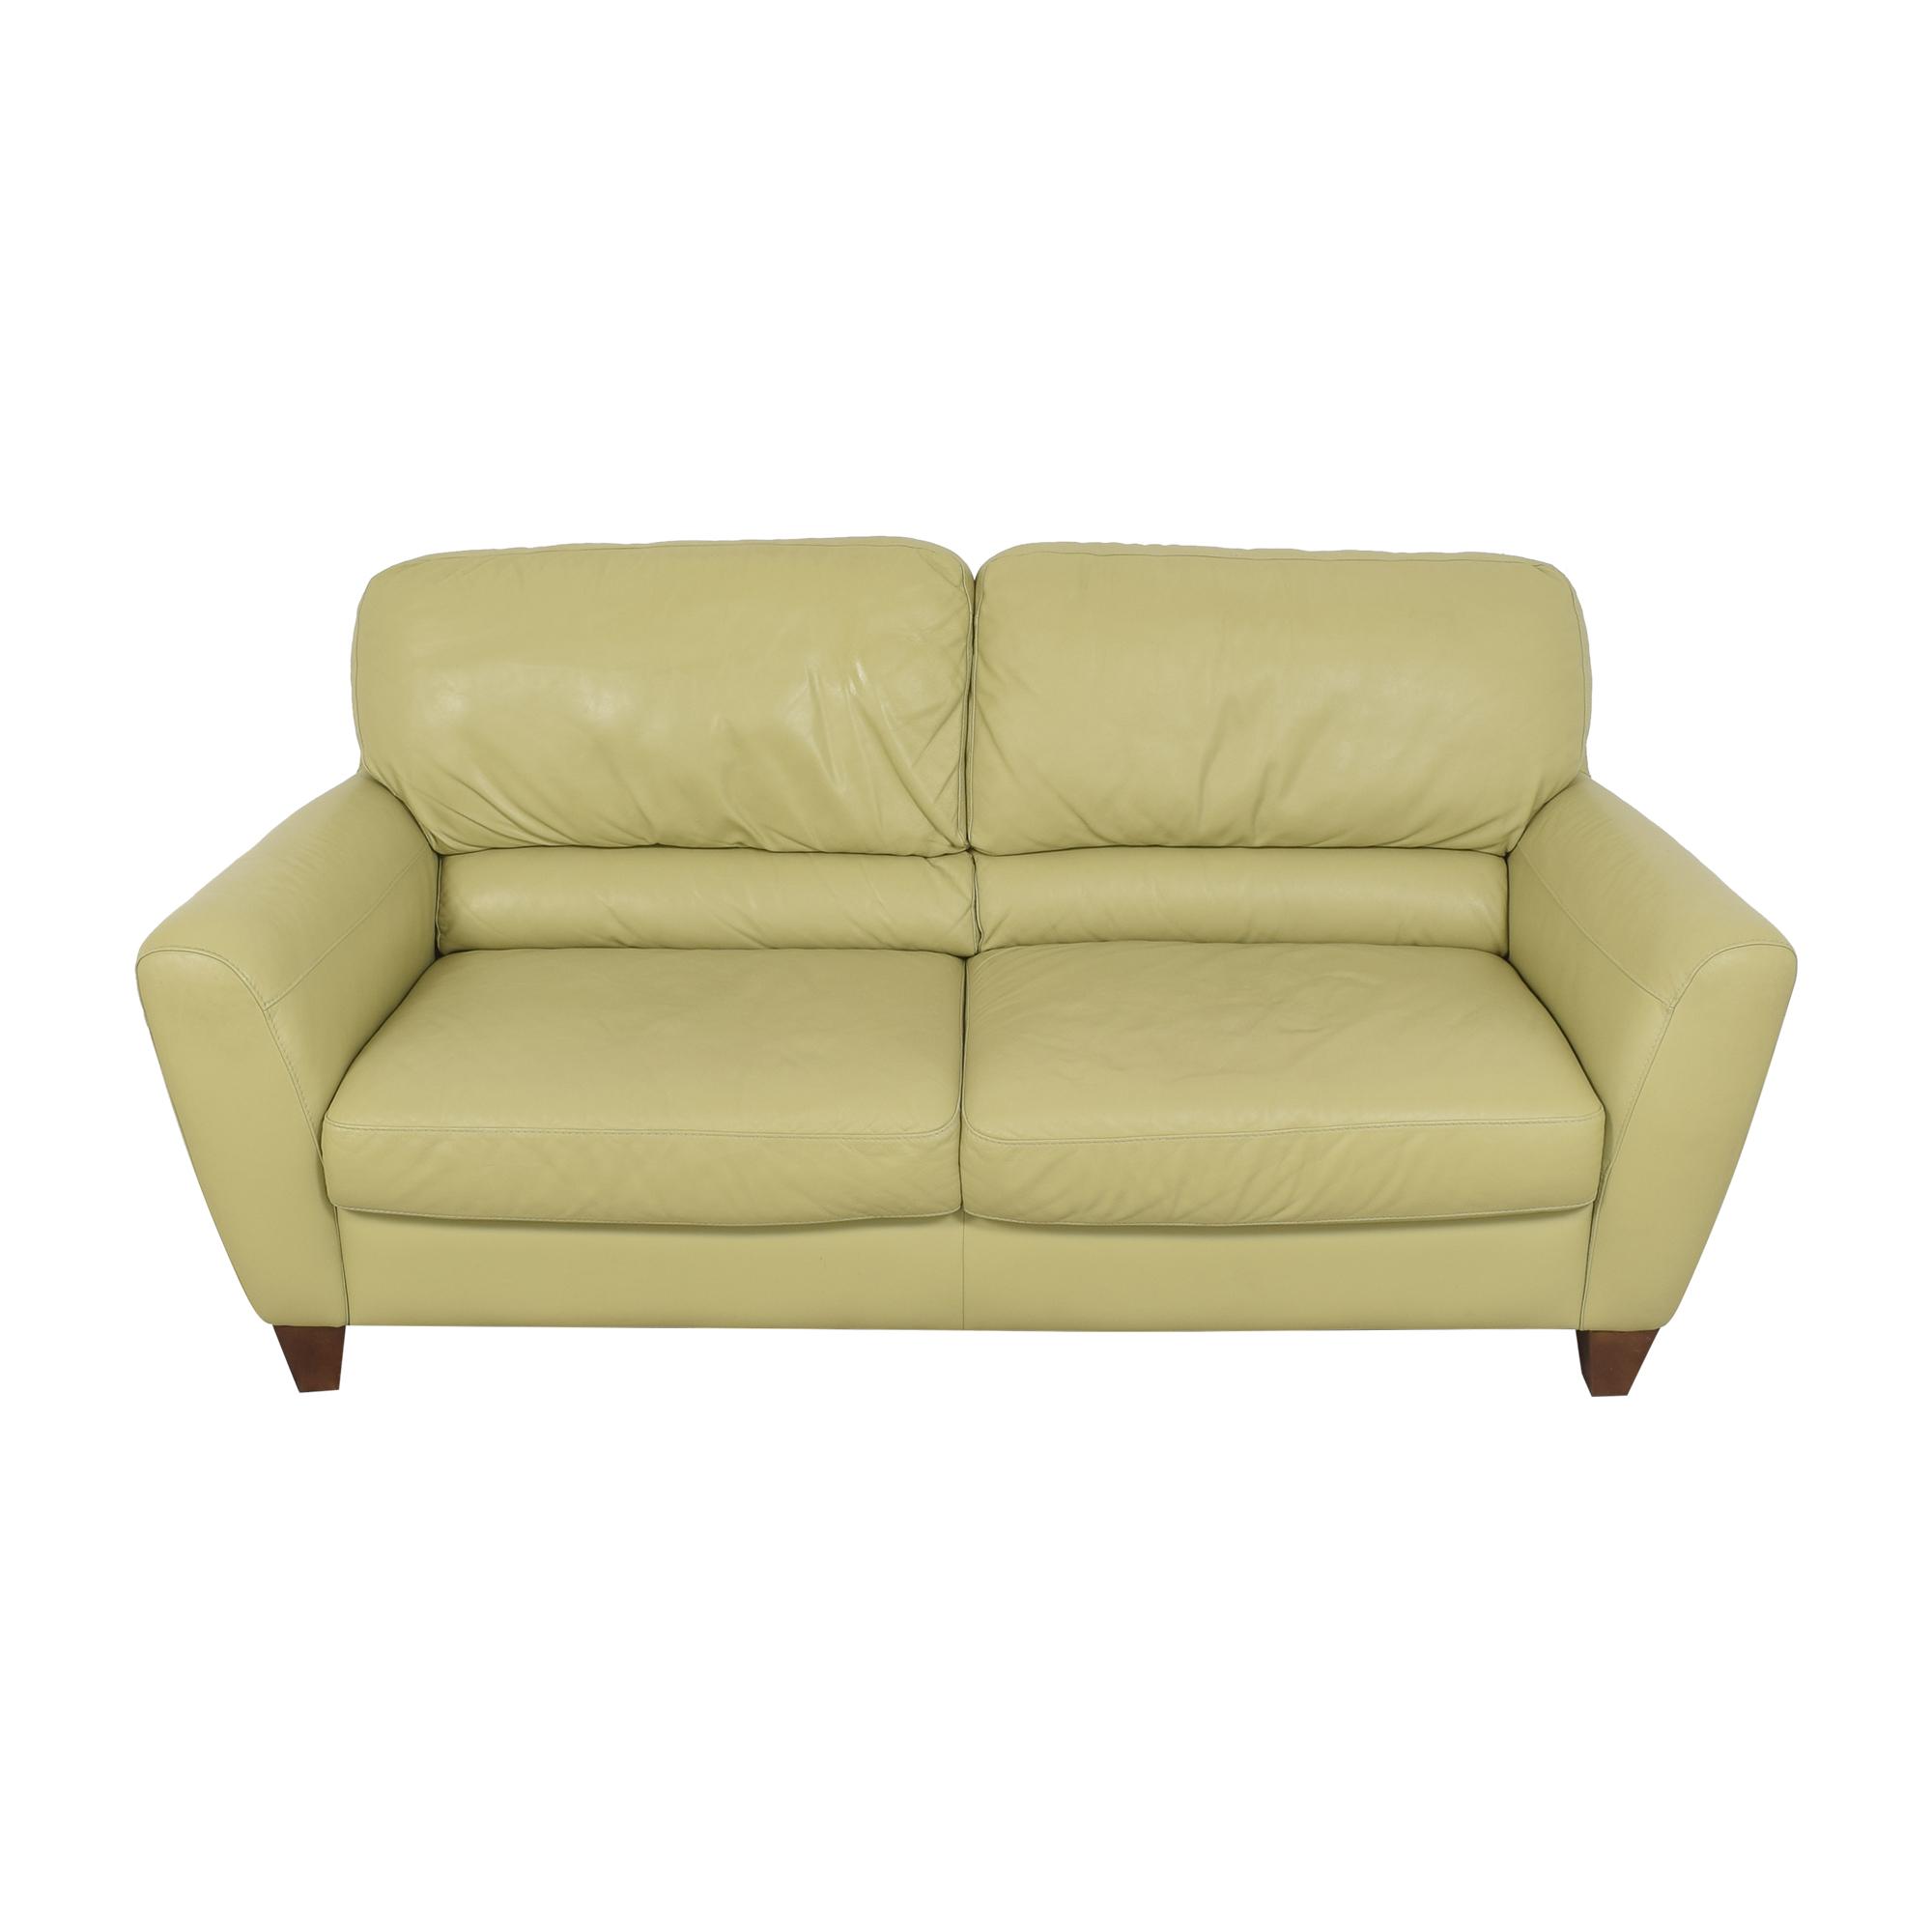 Italsofa Italsofa Two Cushion Sofa price